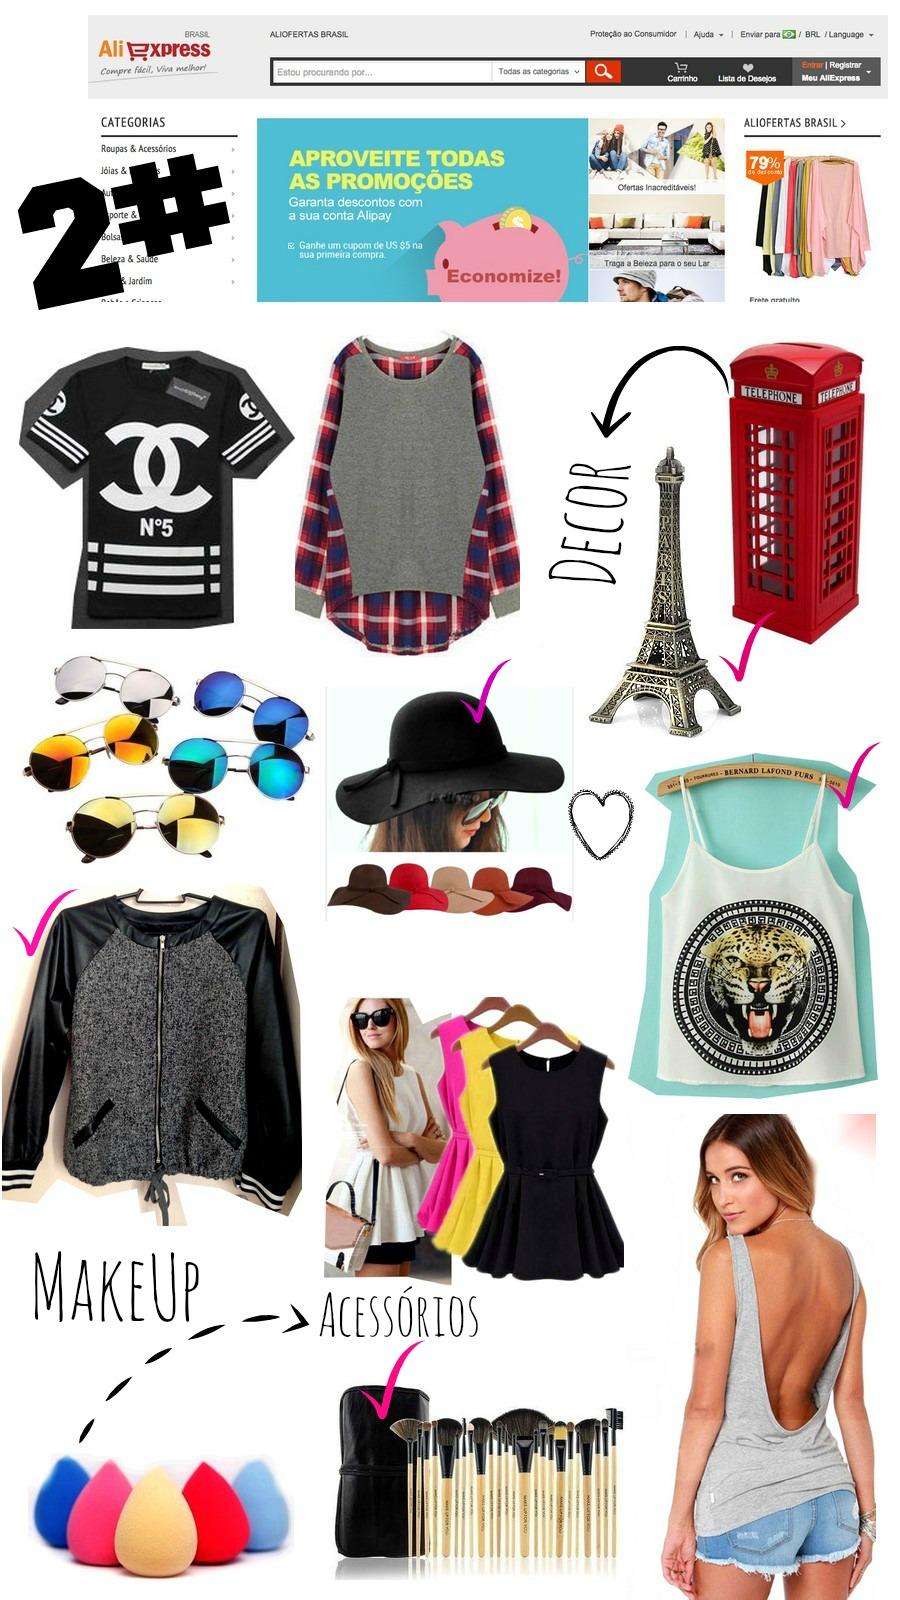 ali-express-compras-oculos-roupa